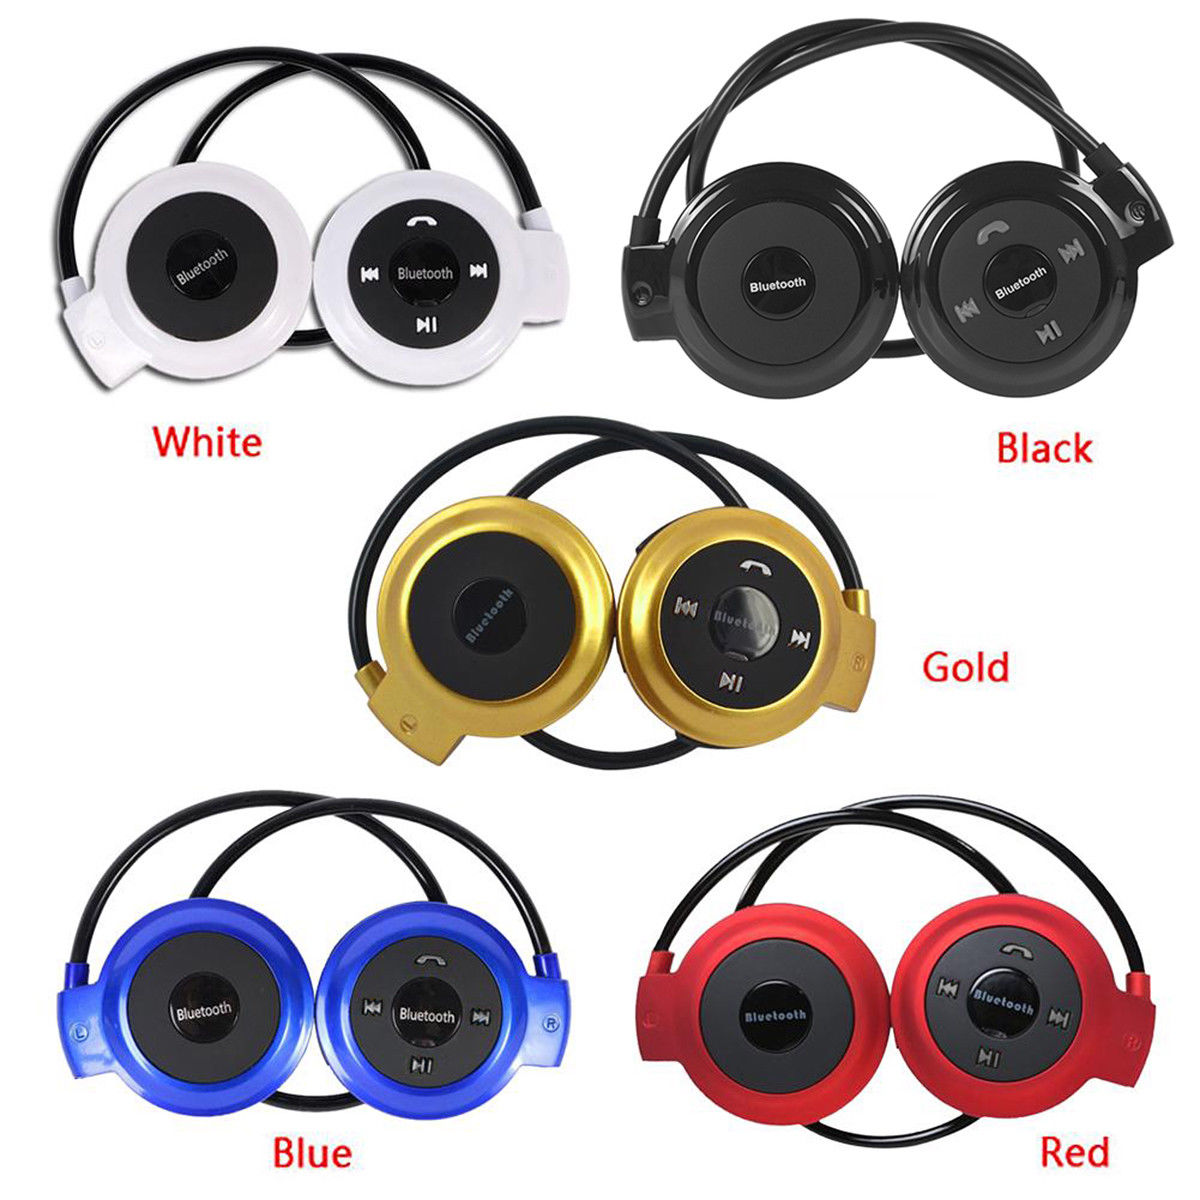 dfa9dfd8f73 MINI503 Sport Wireless Bluetooth Headphones Stereo Earphones Mp3 Music Player  Headset Earpiece Micro SD Card Slot FM Radio Mic